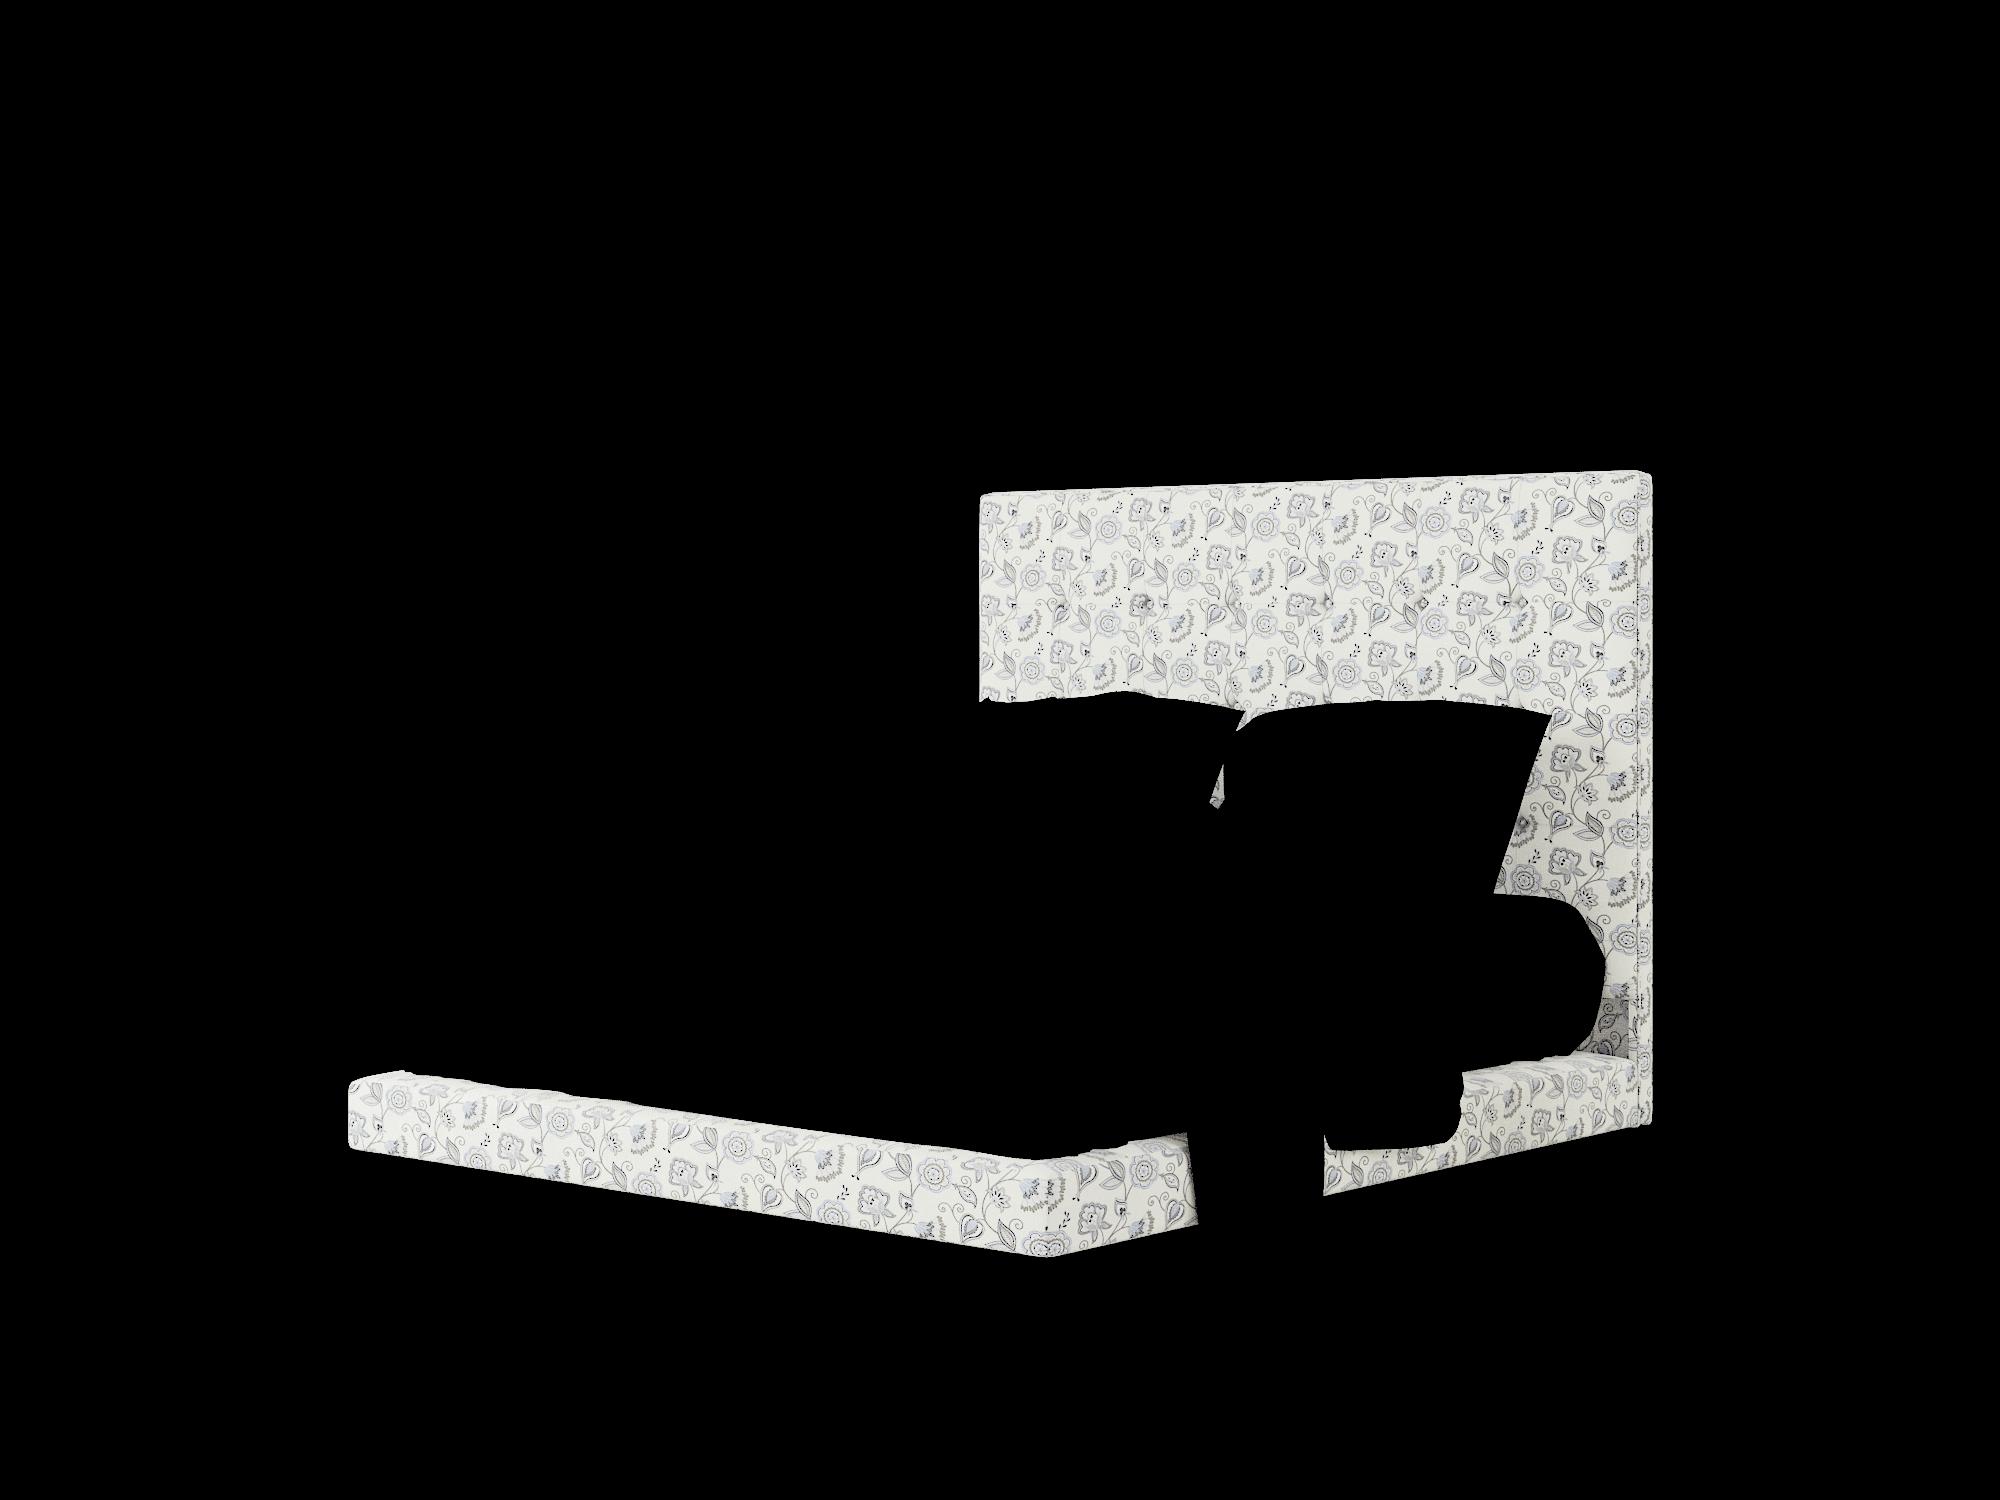 Jolie Avignon Sky Bed King Room Texture